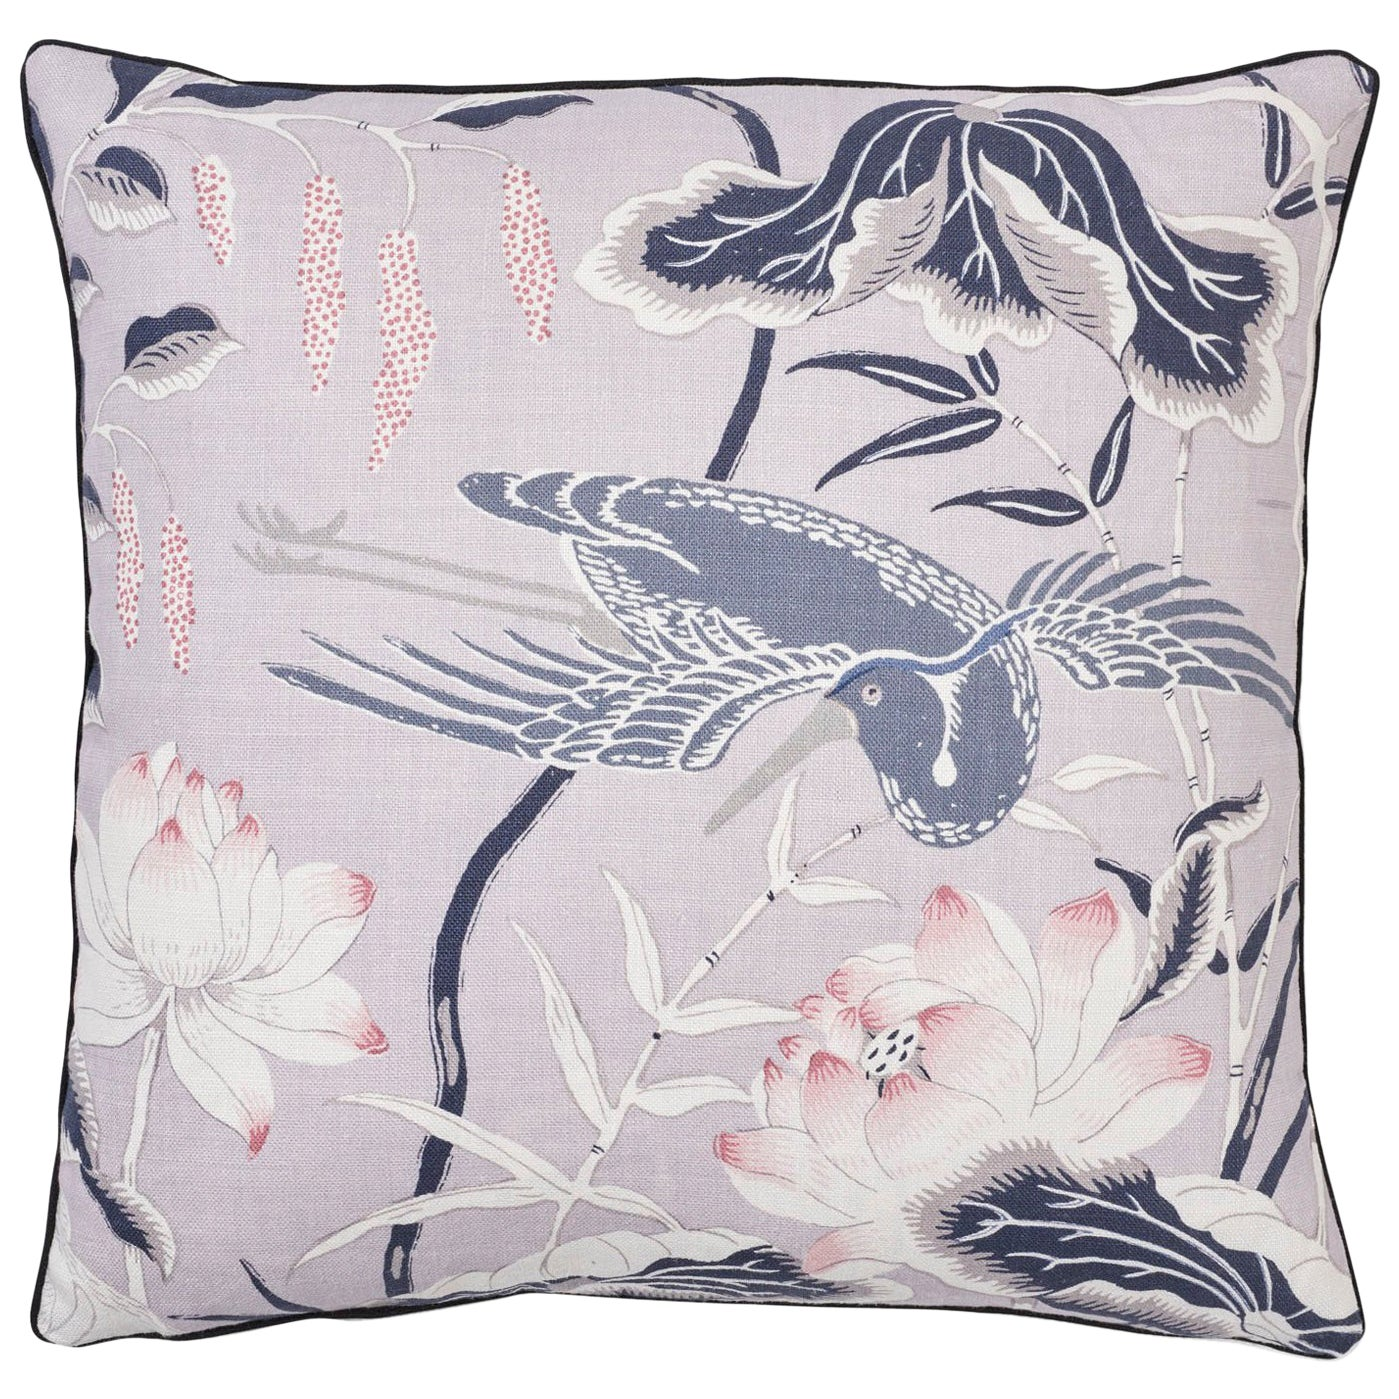 Schumacher Lotus Garden Japanese Floral Lilac Two-Sided Linen Pillow